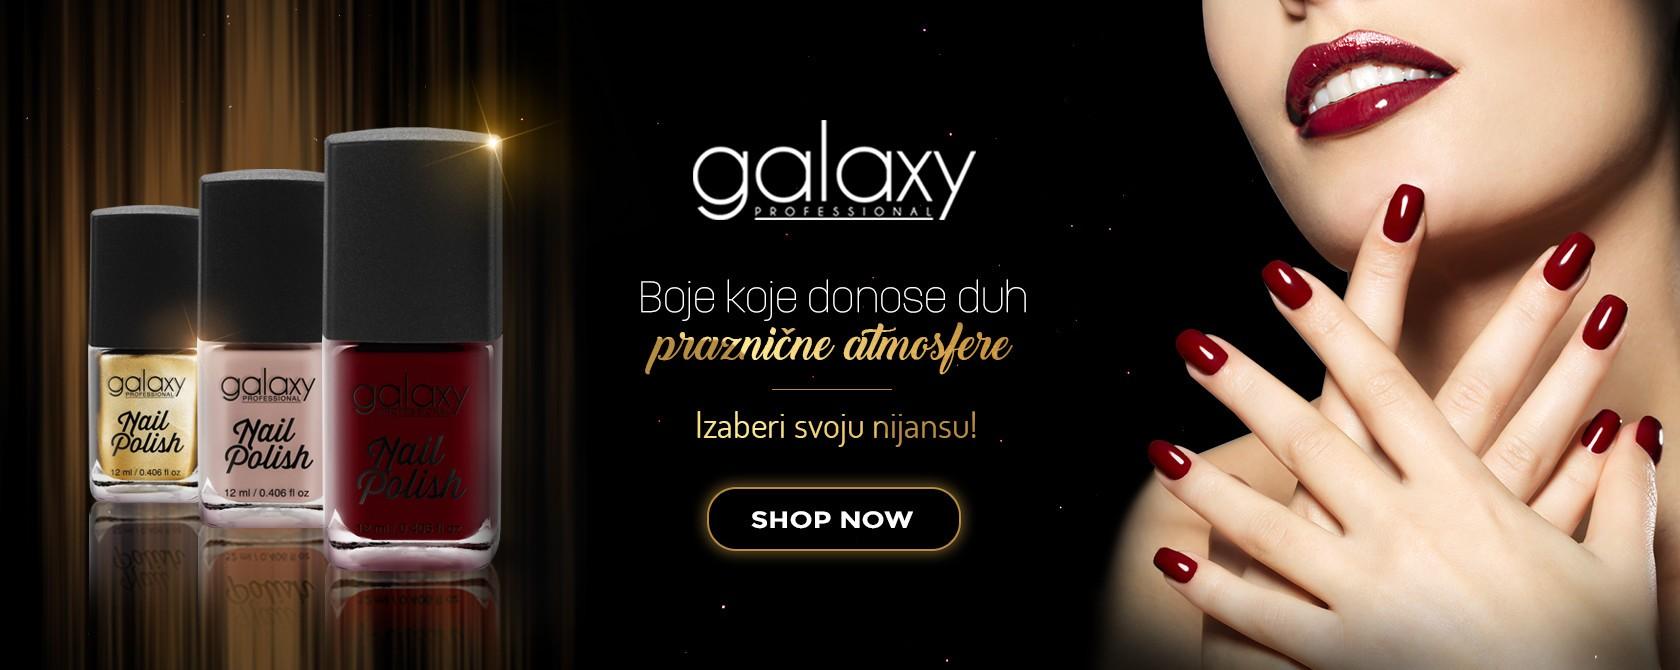 Galaxy lakovi za nokte